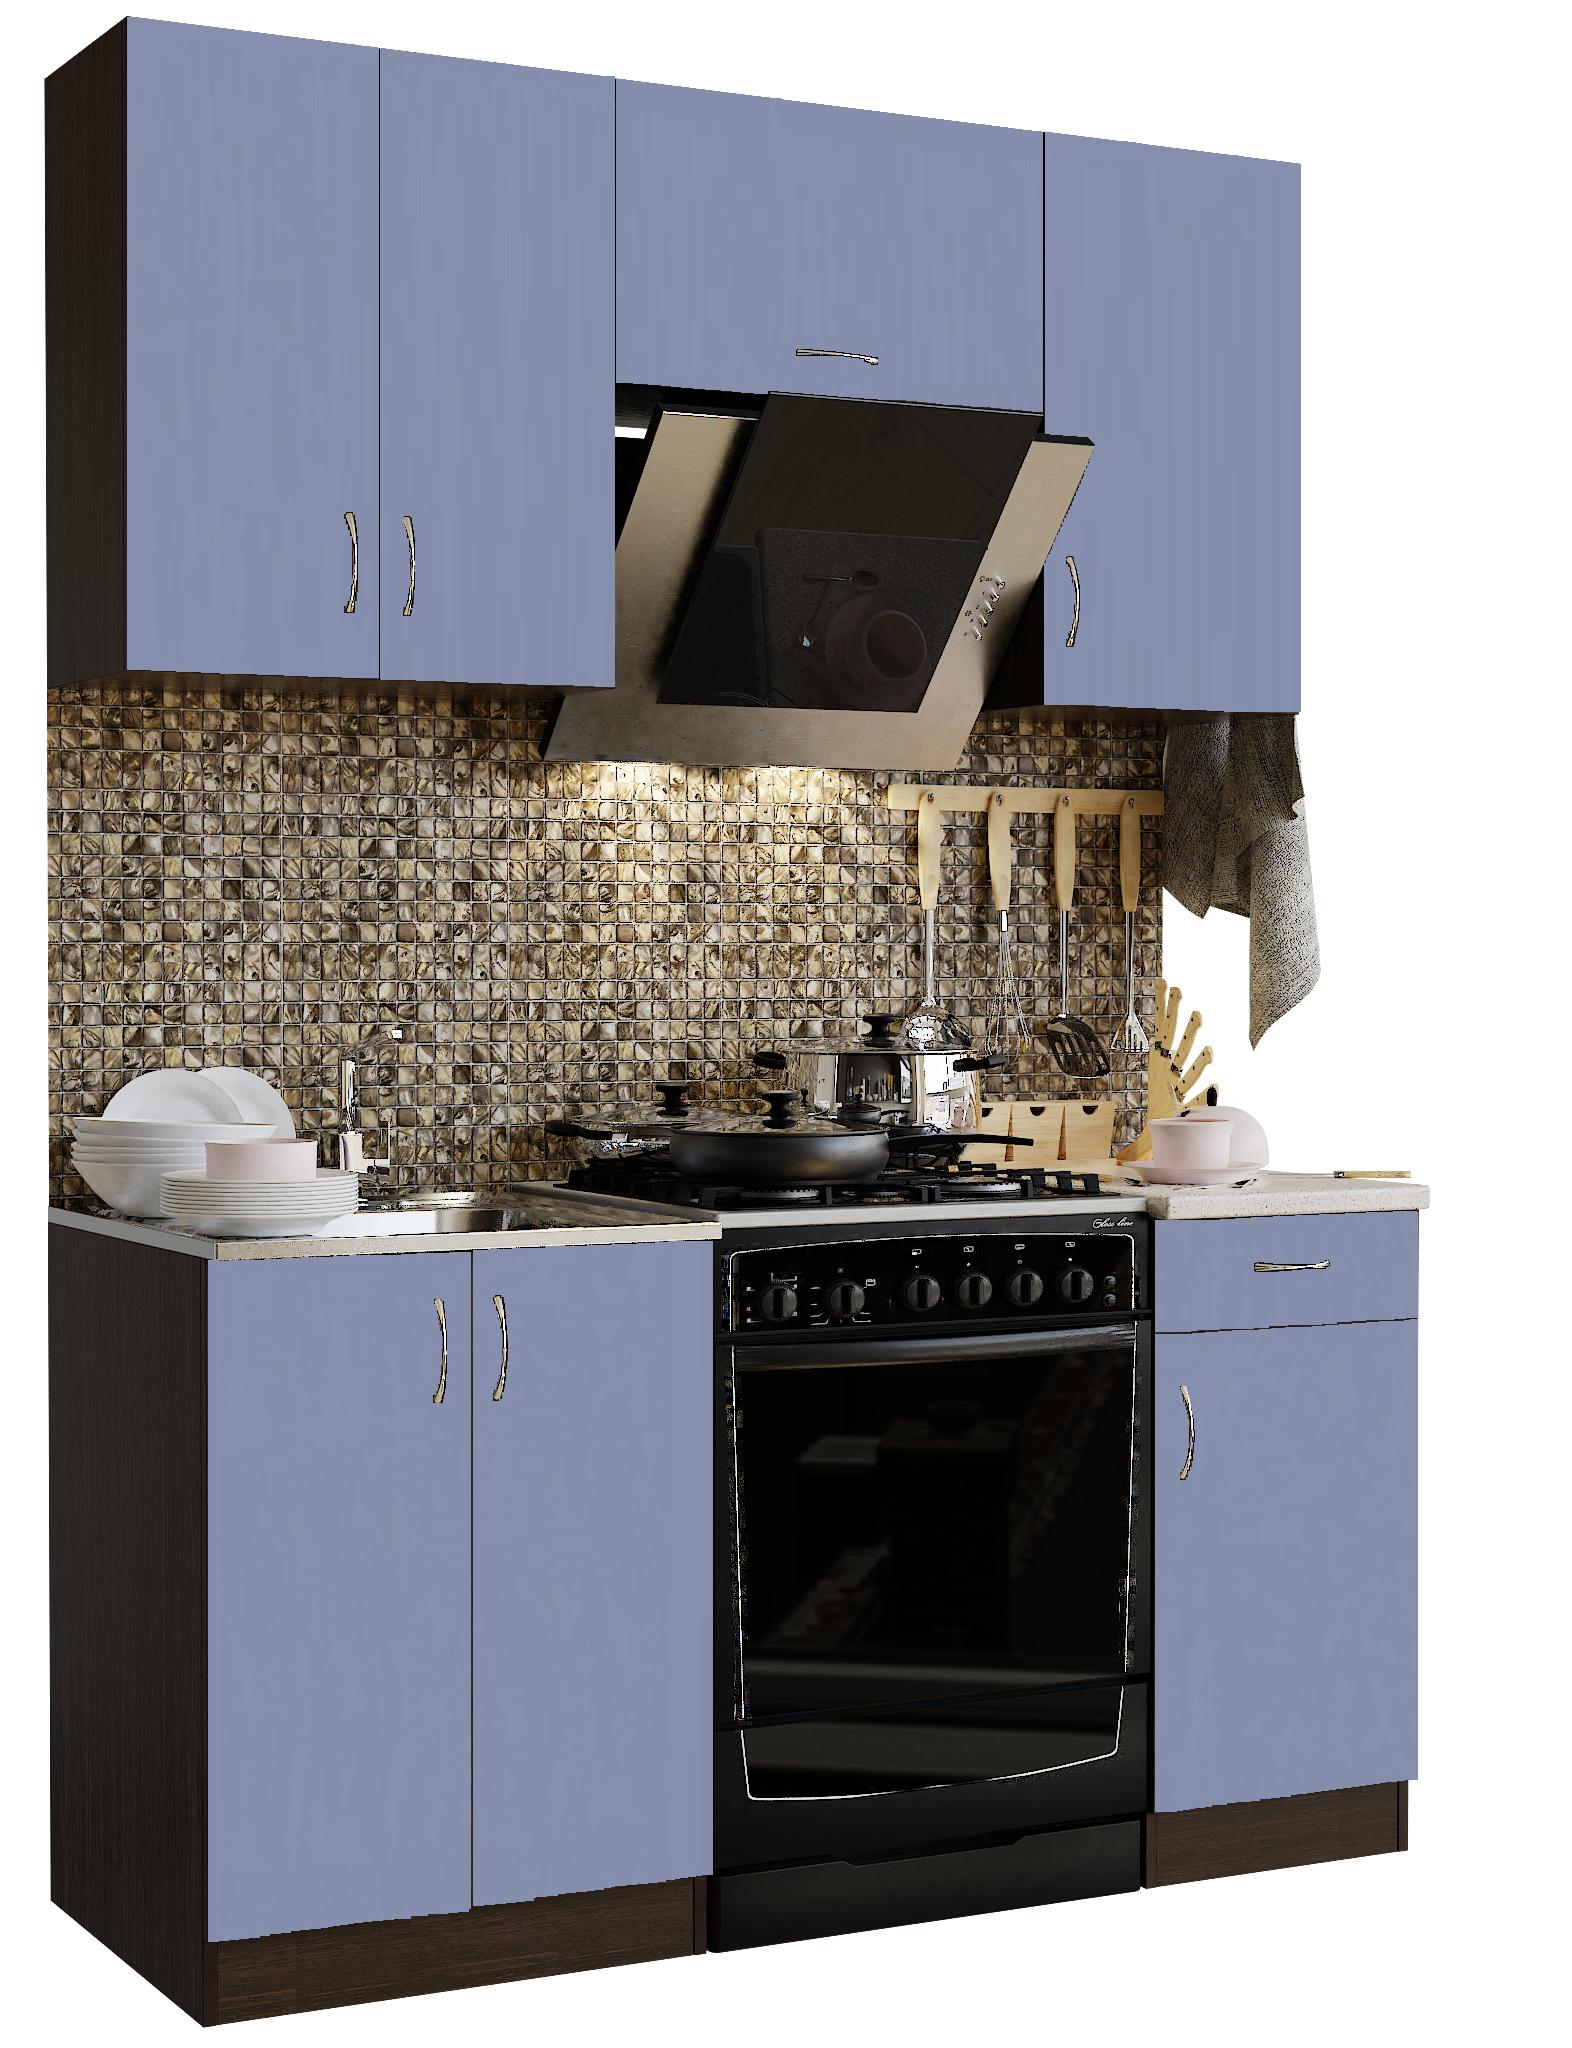 Кухонный гарнитур Sanvut ГК1600-3.9.2 Венге / Лаванда